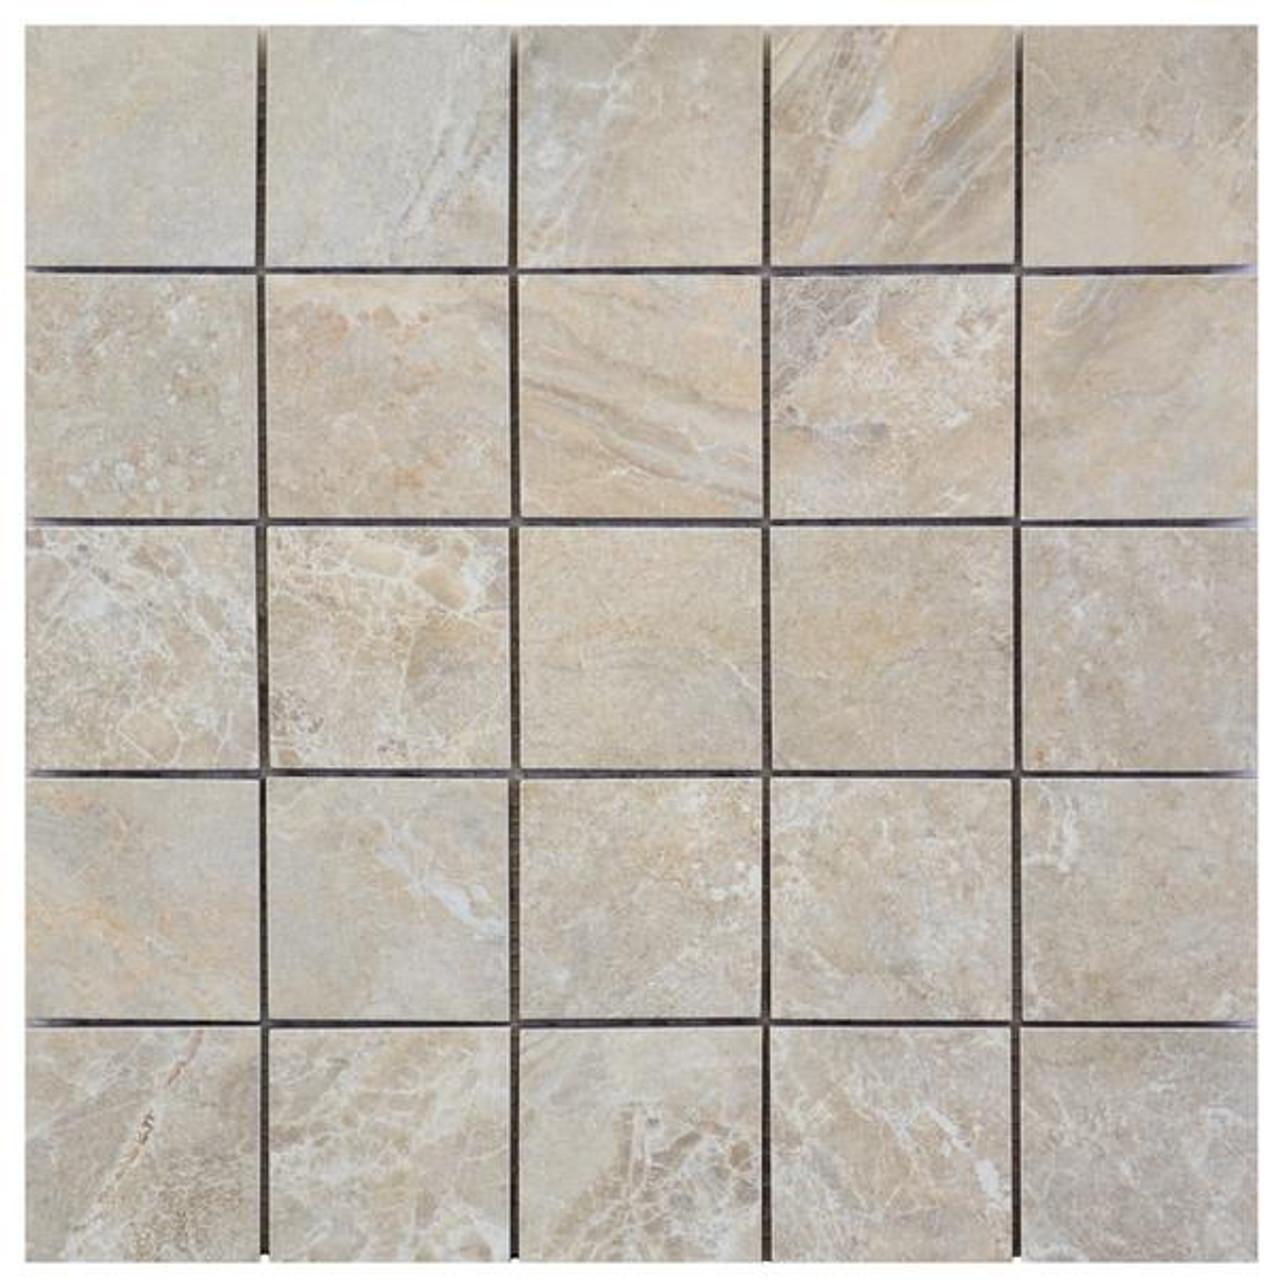 icaria dedalo beige 2x2 mosaic 12x12